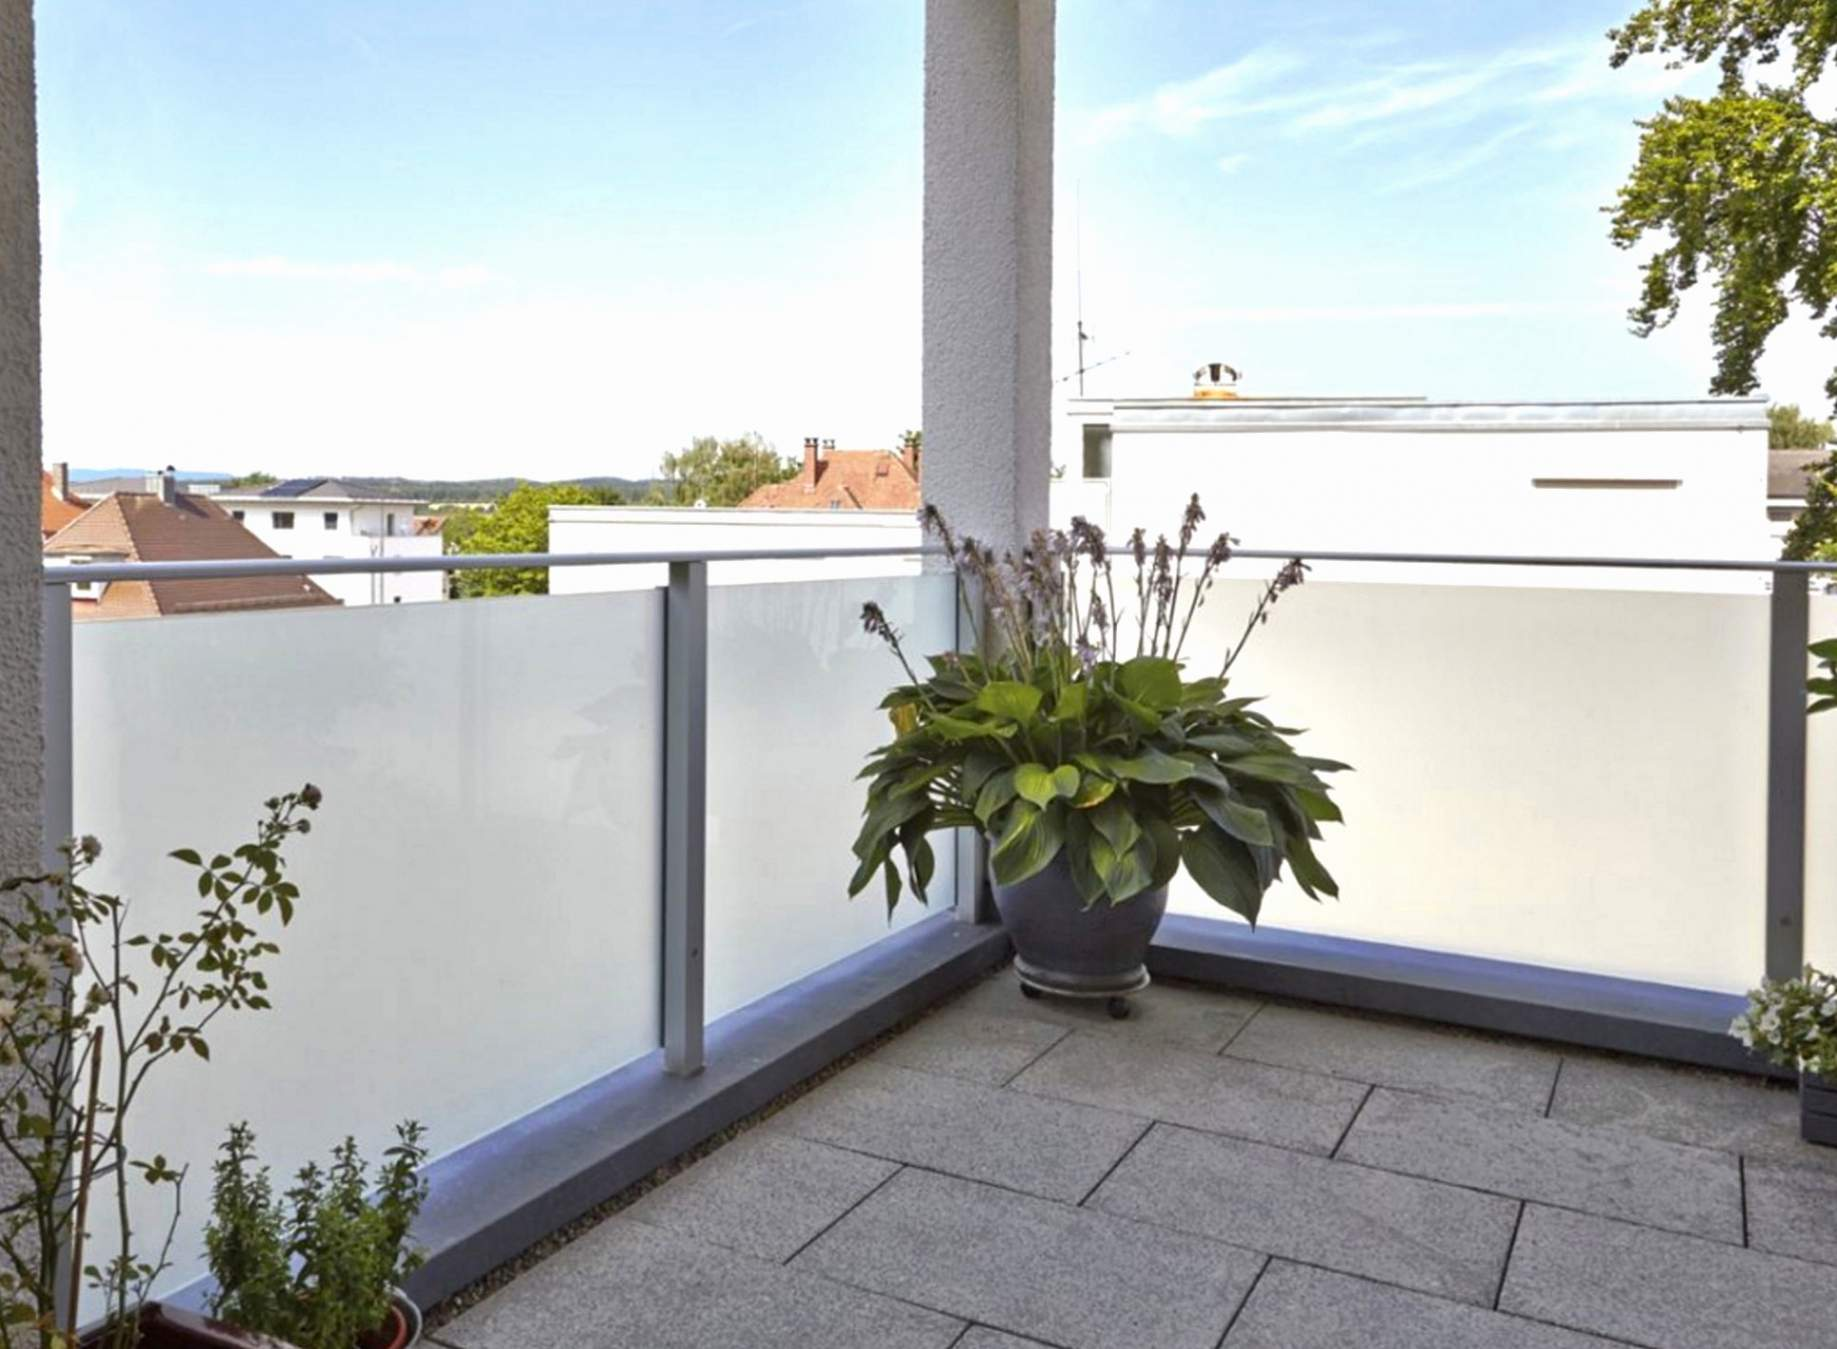 Garten Ideen Diy Genial Gartendeko Selber Machen — Temobardz Home Blog